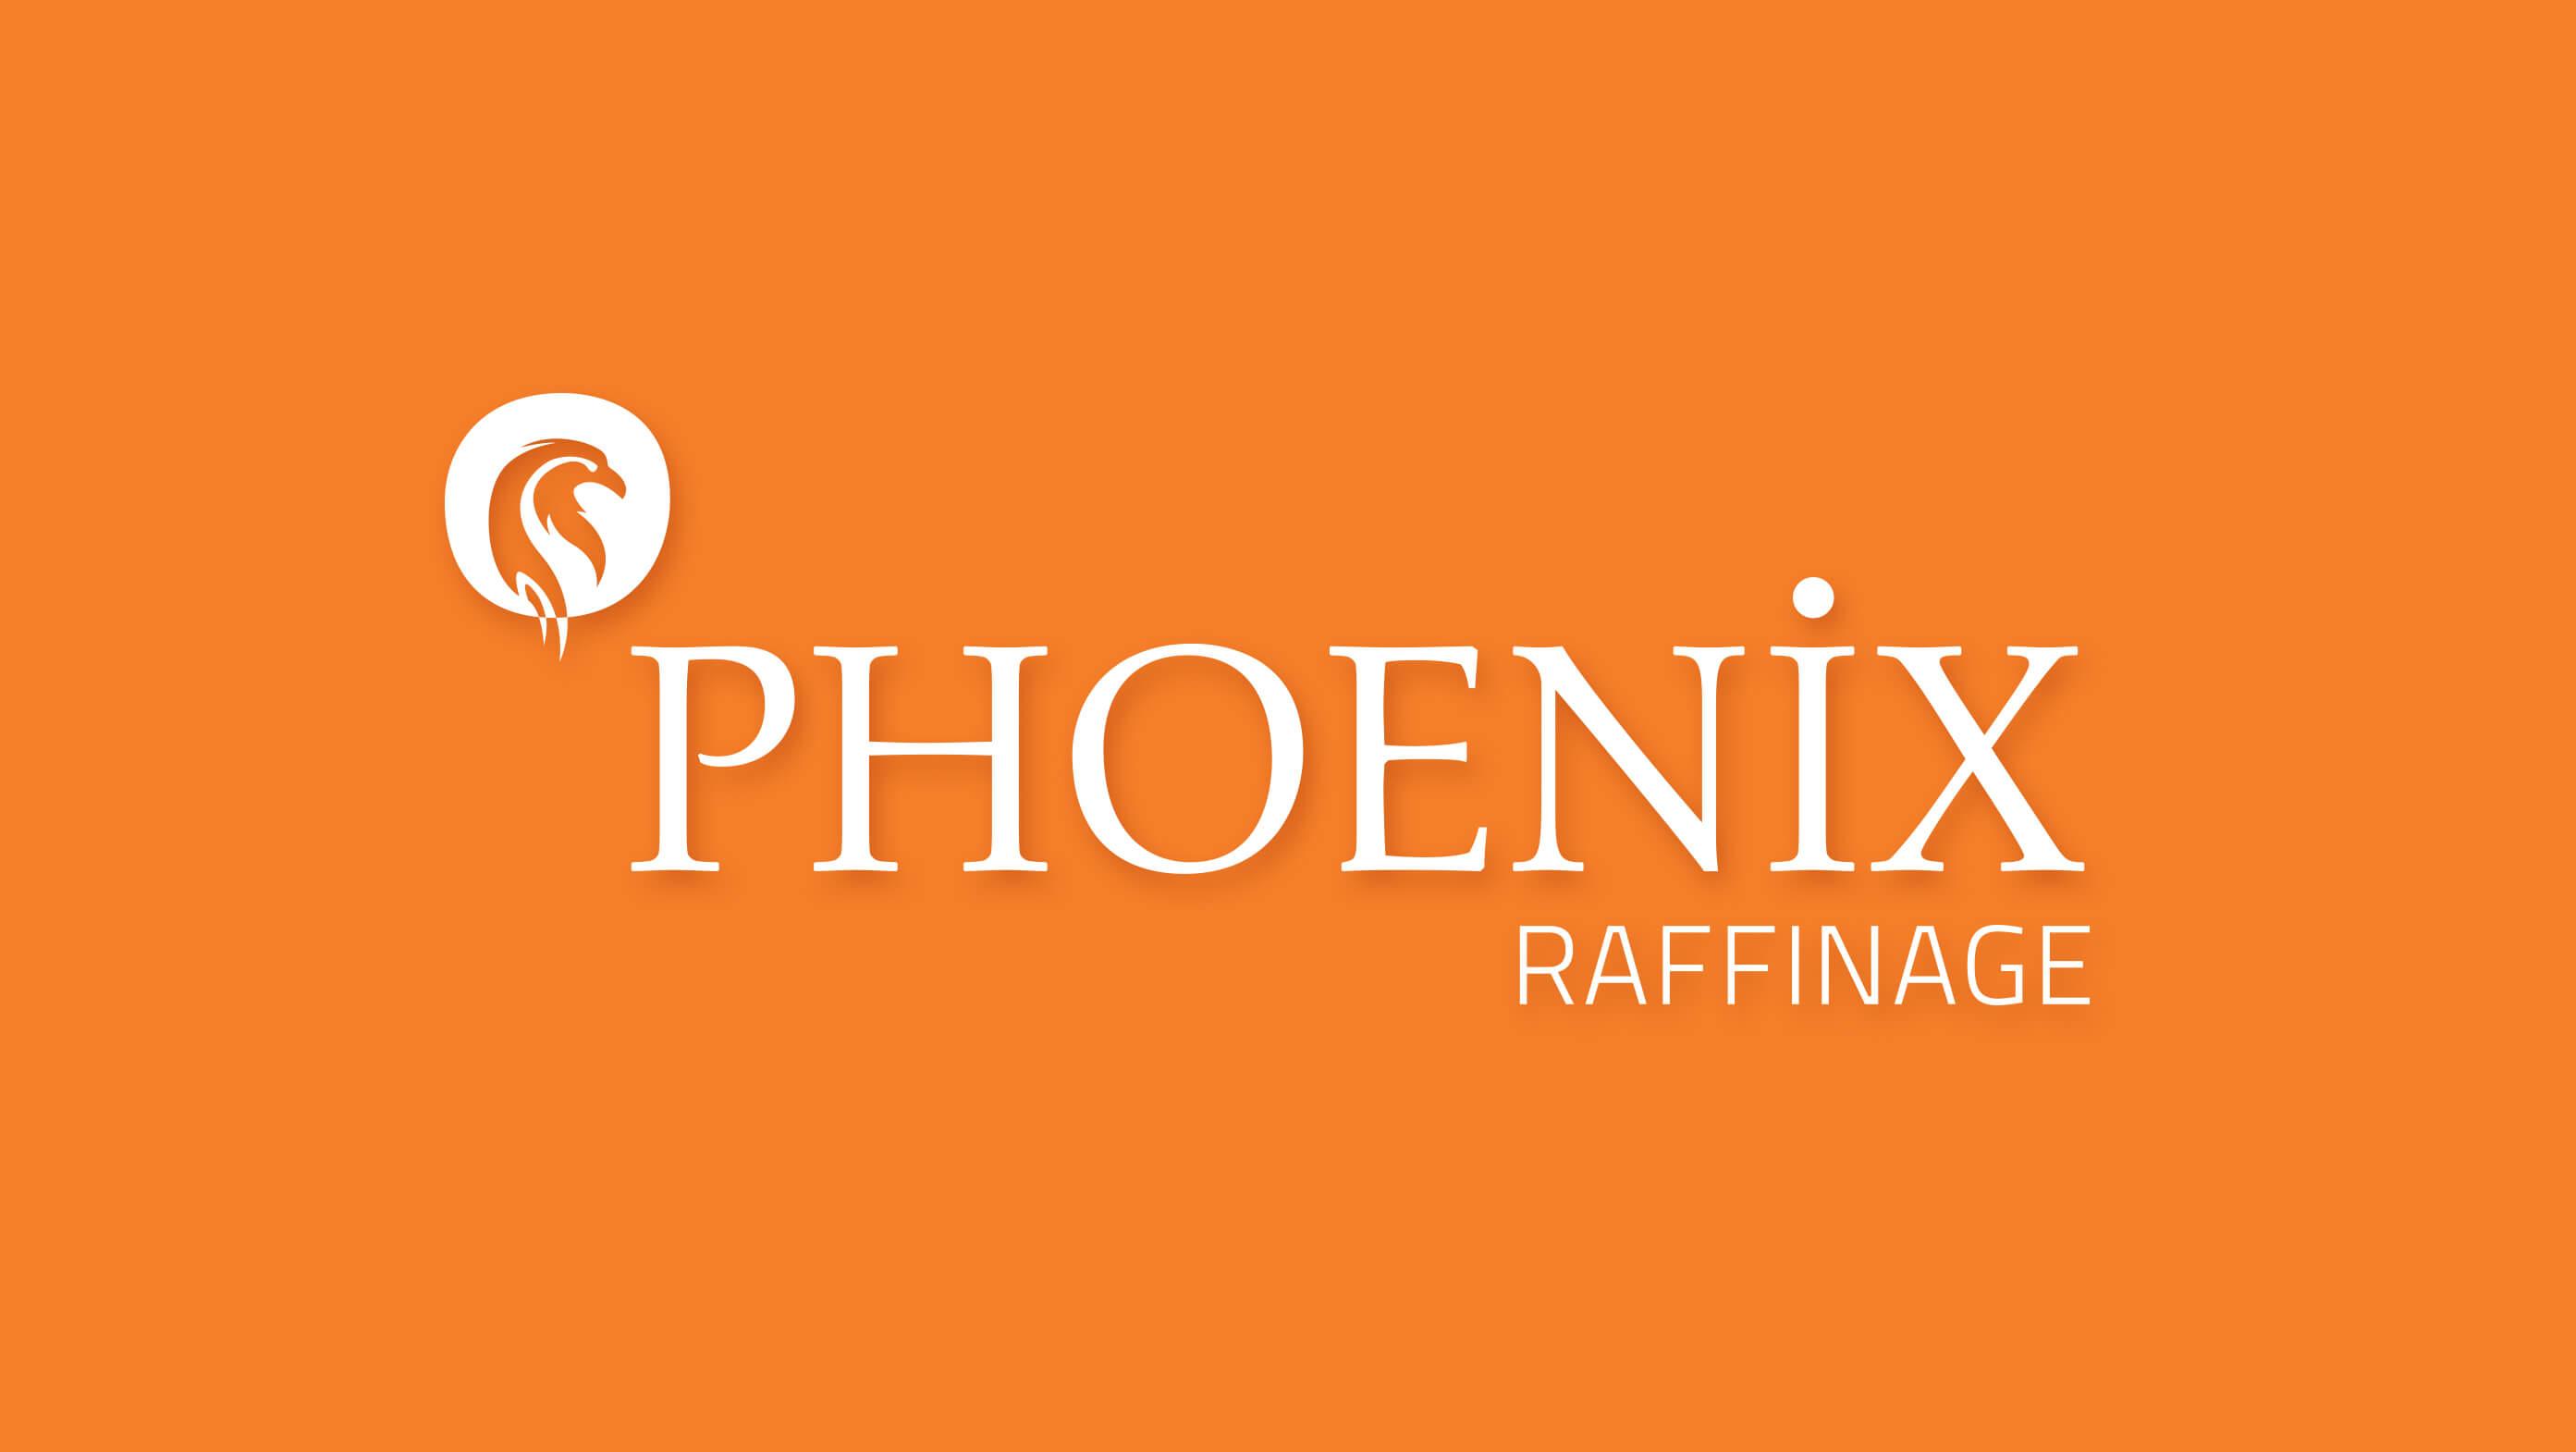 Phoenix Raffinage